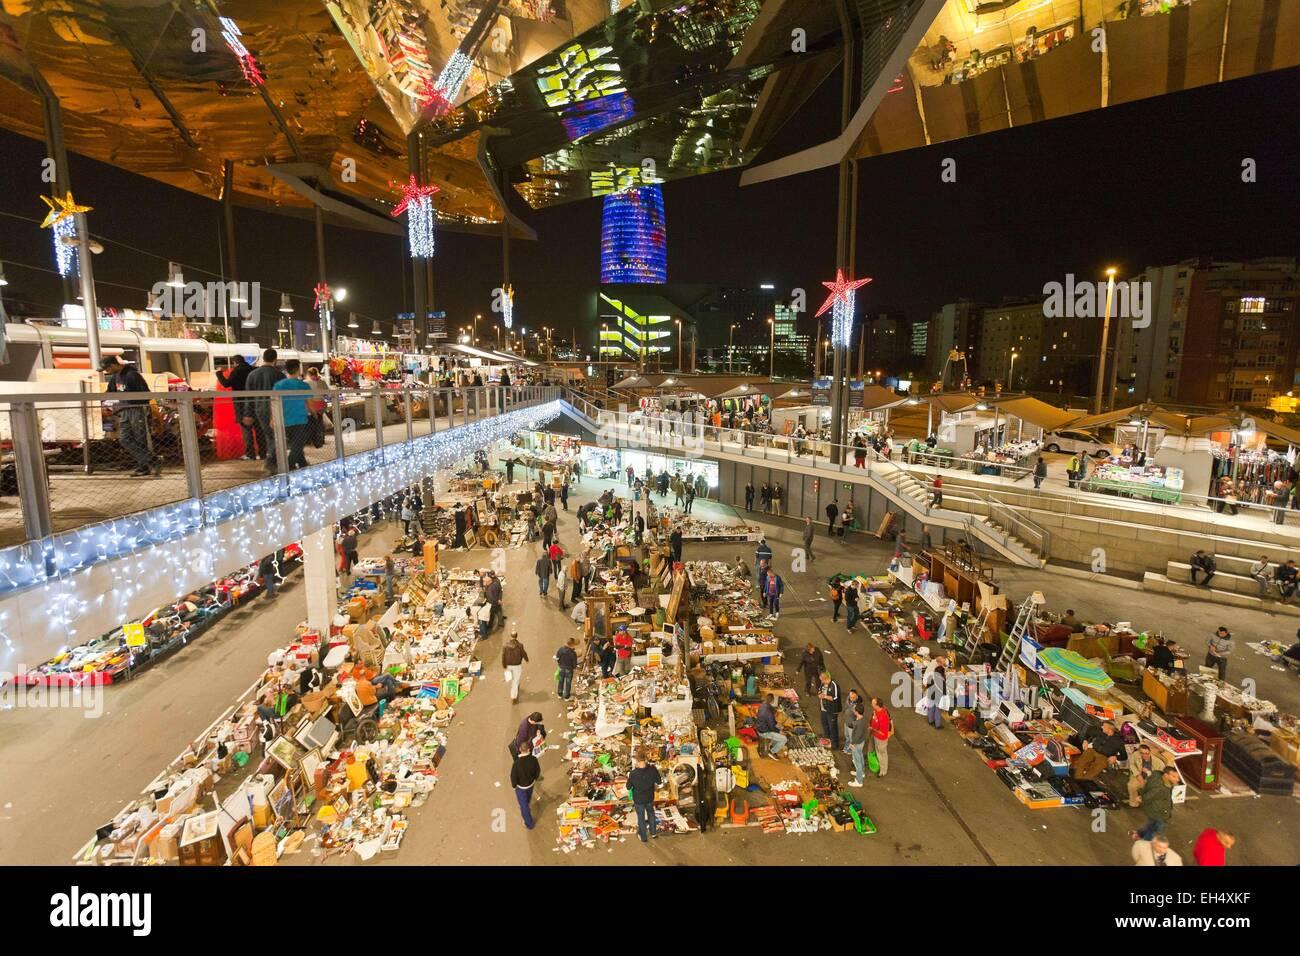 Horario encants glories barcelona simple horario encants for El mercat de les glories